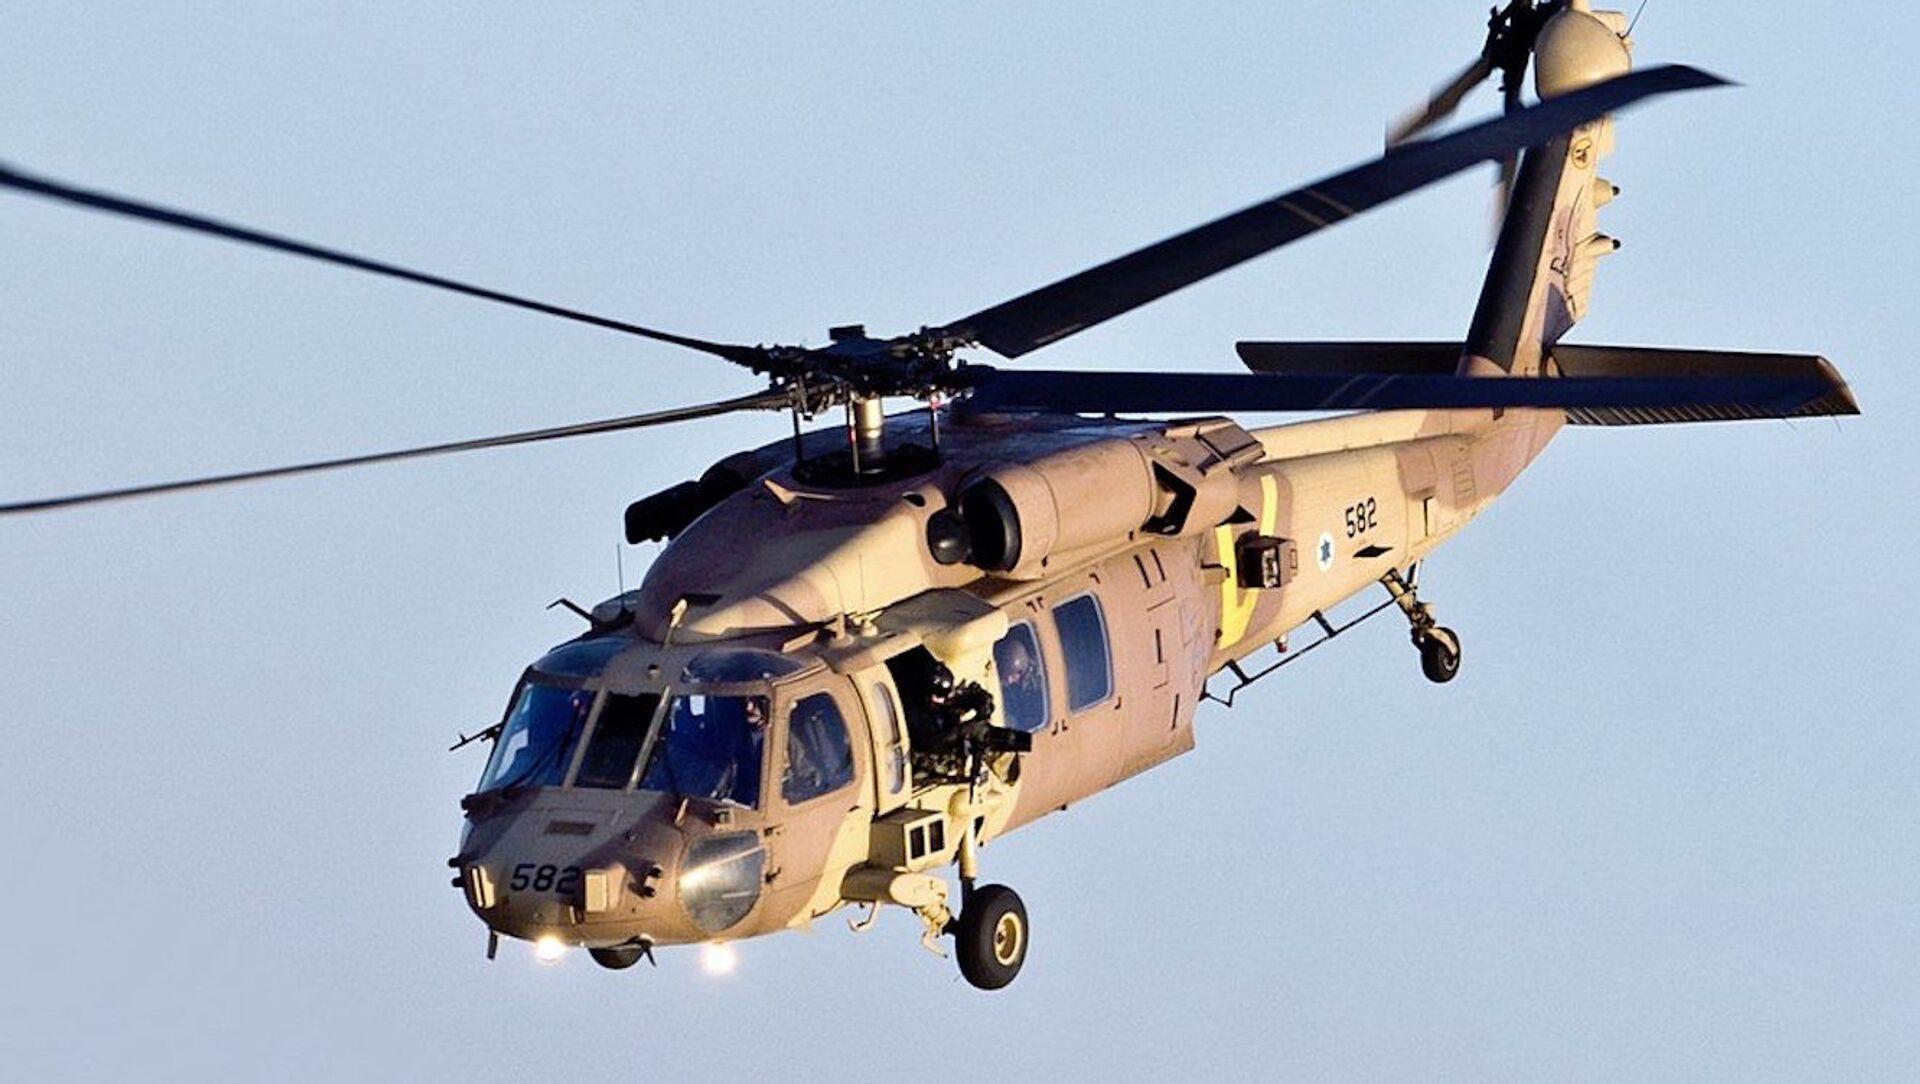 Un helicóptero Sikorsky UH-60 Black Hawk israelí - Sputnik Mundo, 1920, 02.02.2021